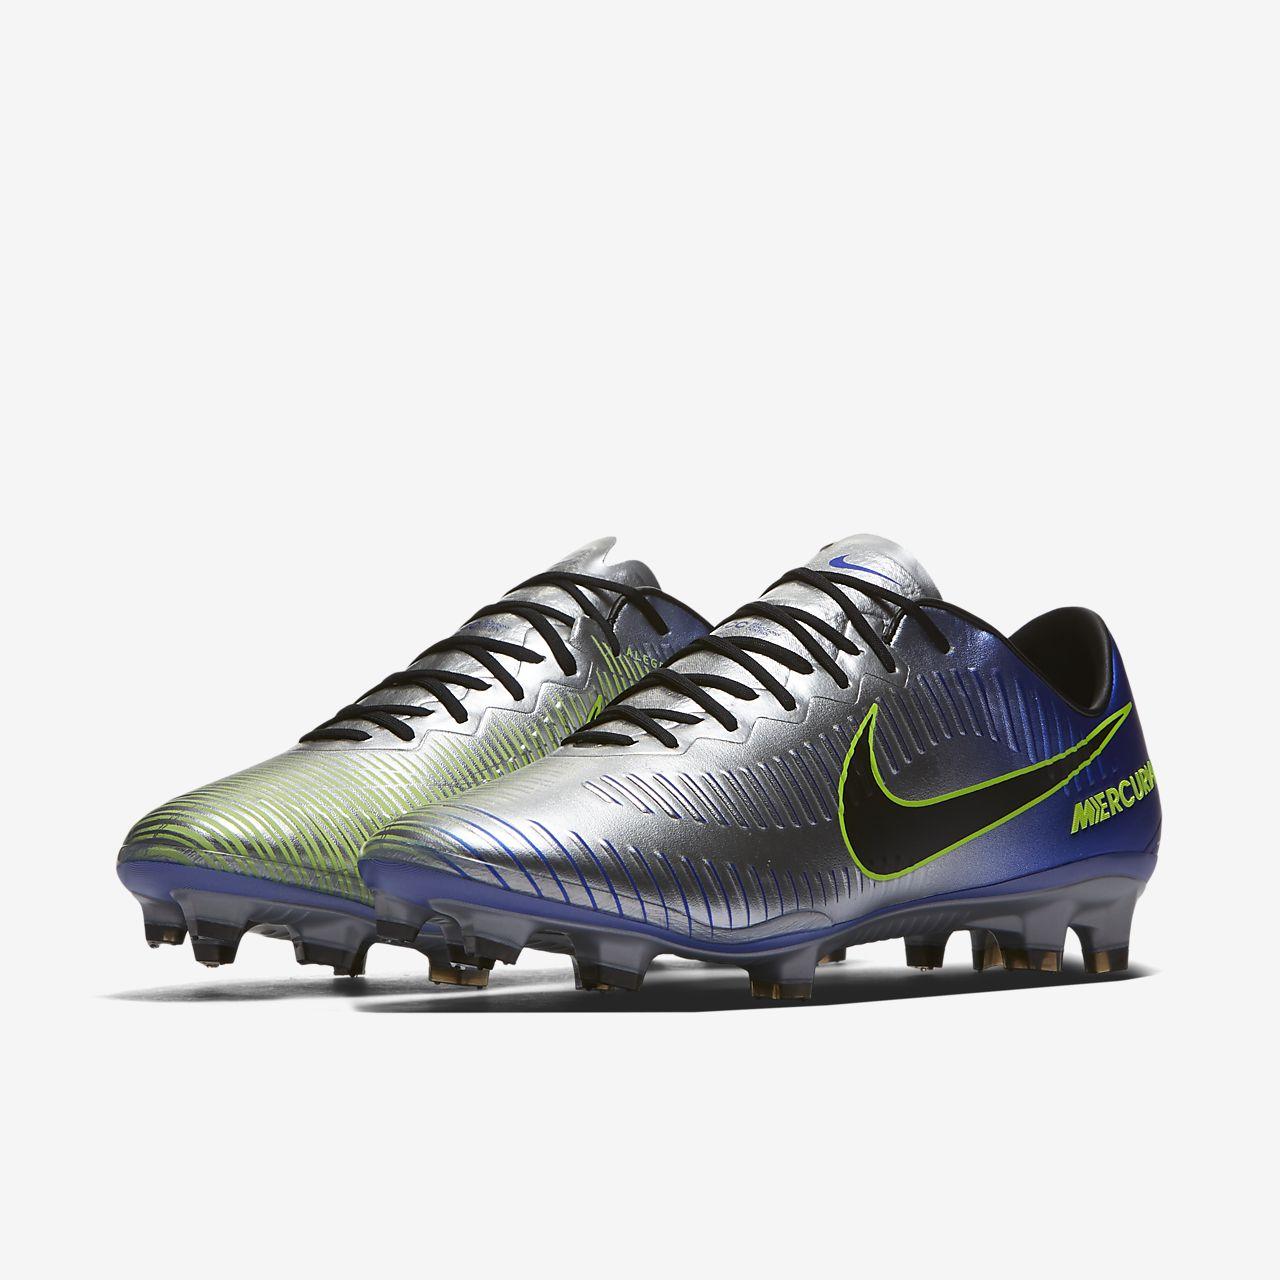 ... Nike Mercurial Vapor XI Neymar Firm-Ground Football Boot